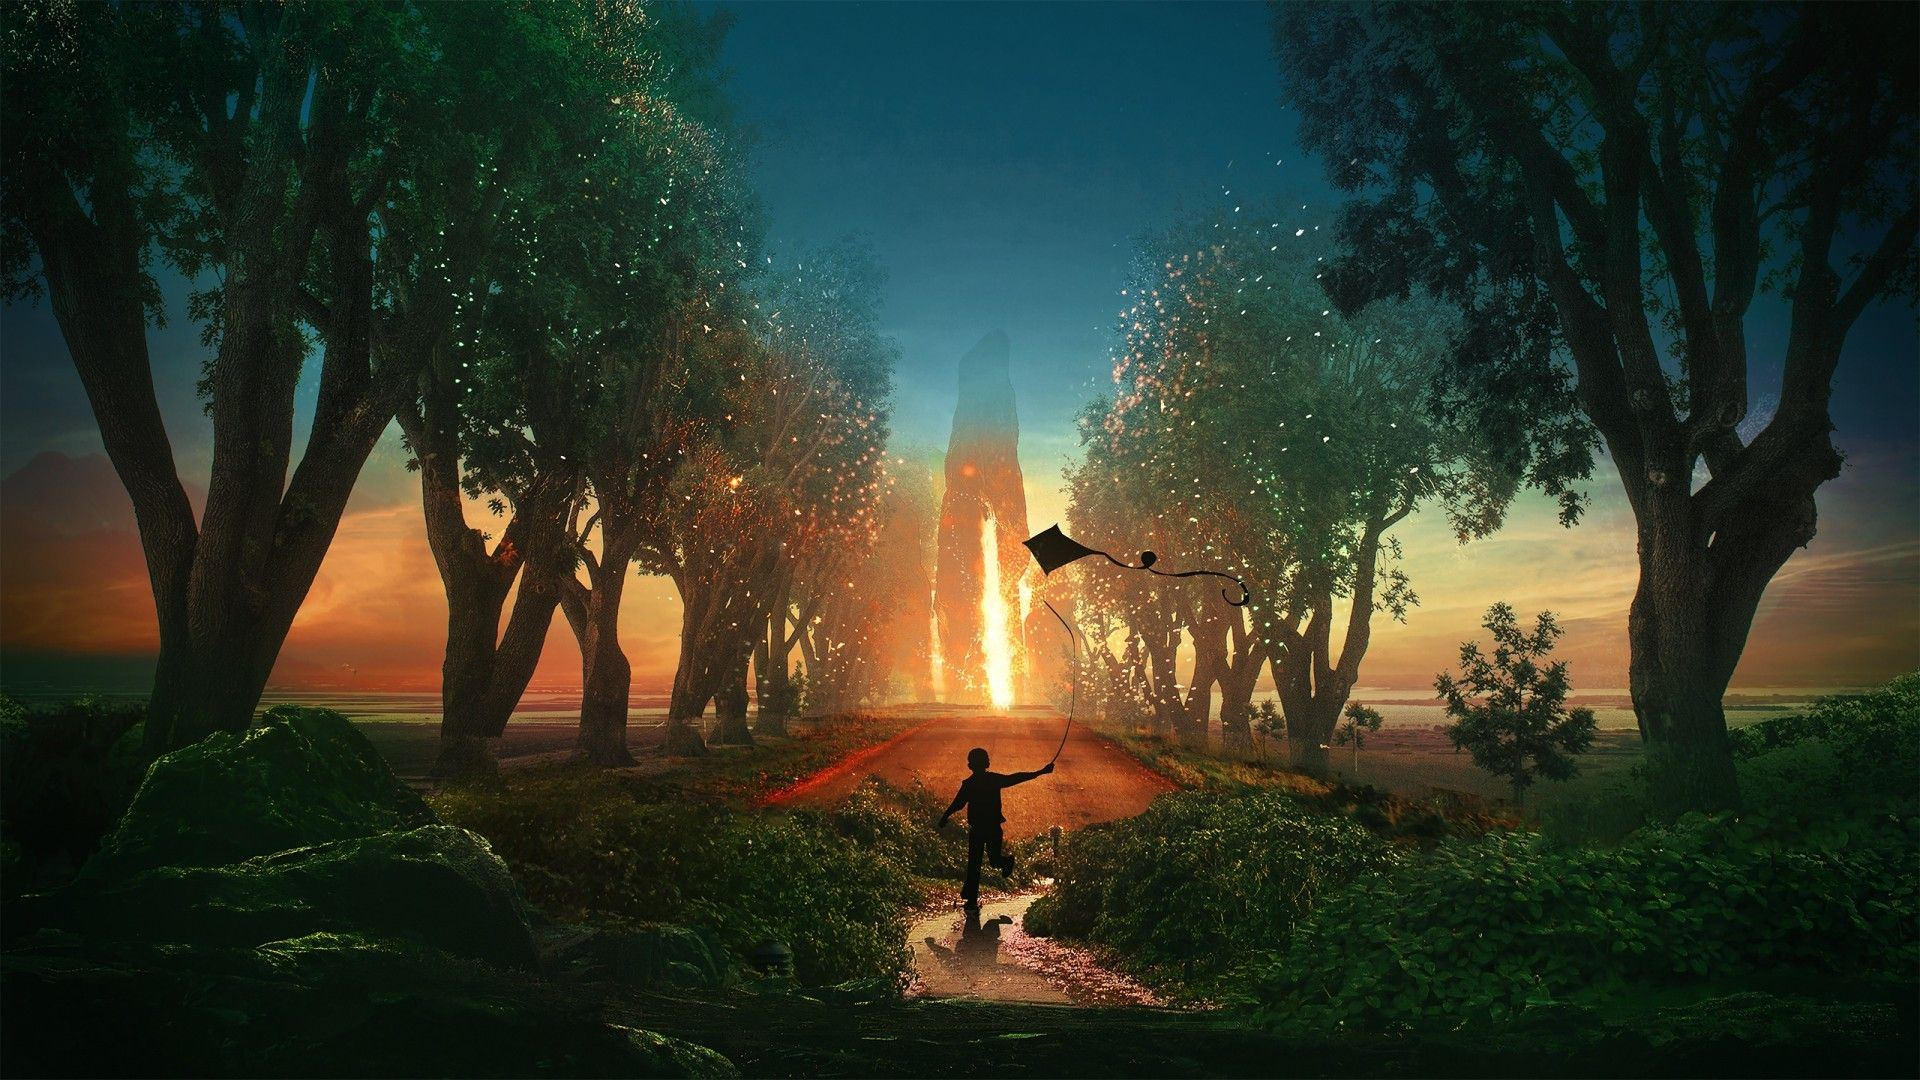 kid in a fantasy lucid dream